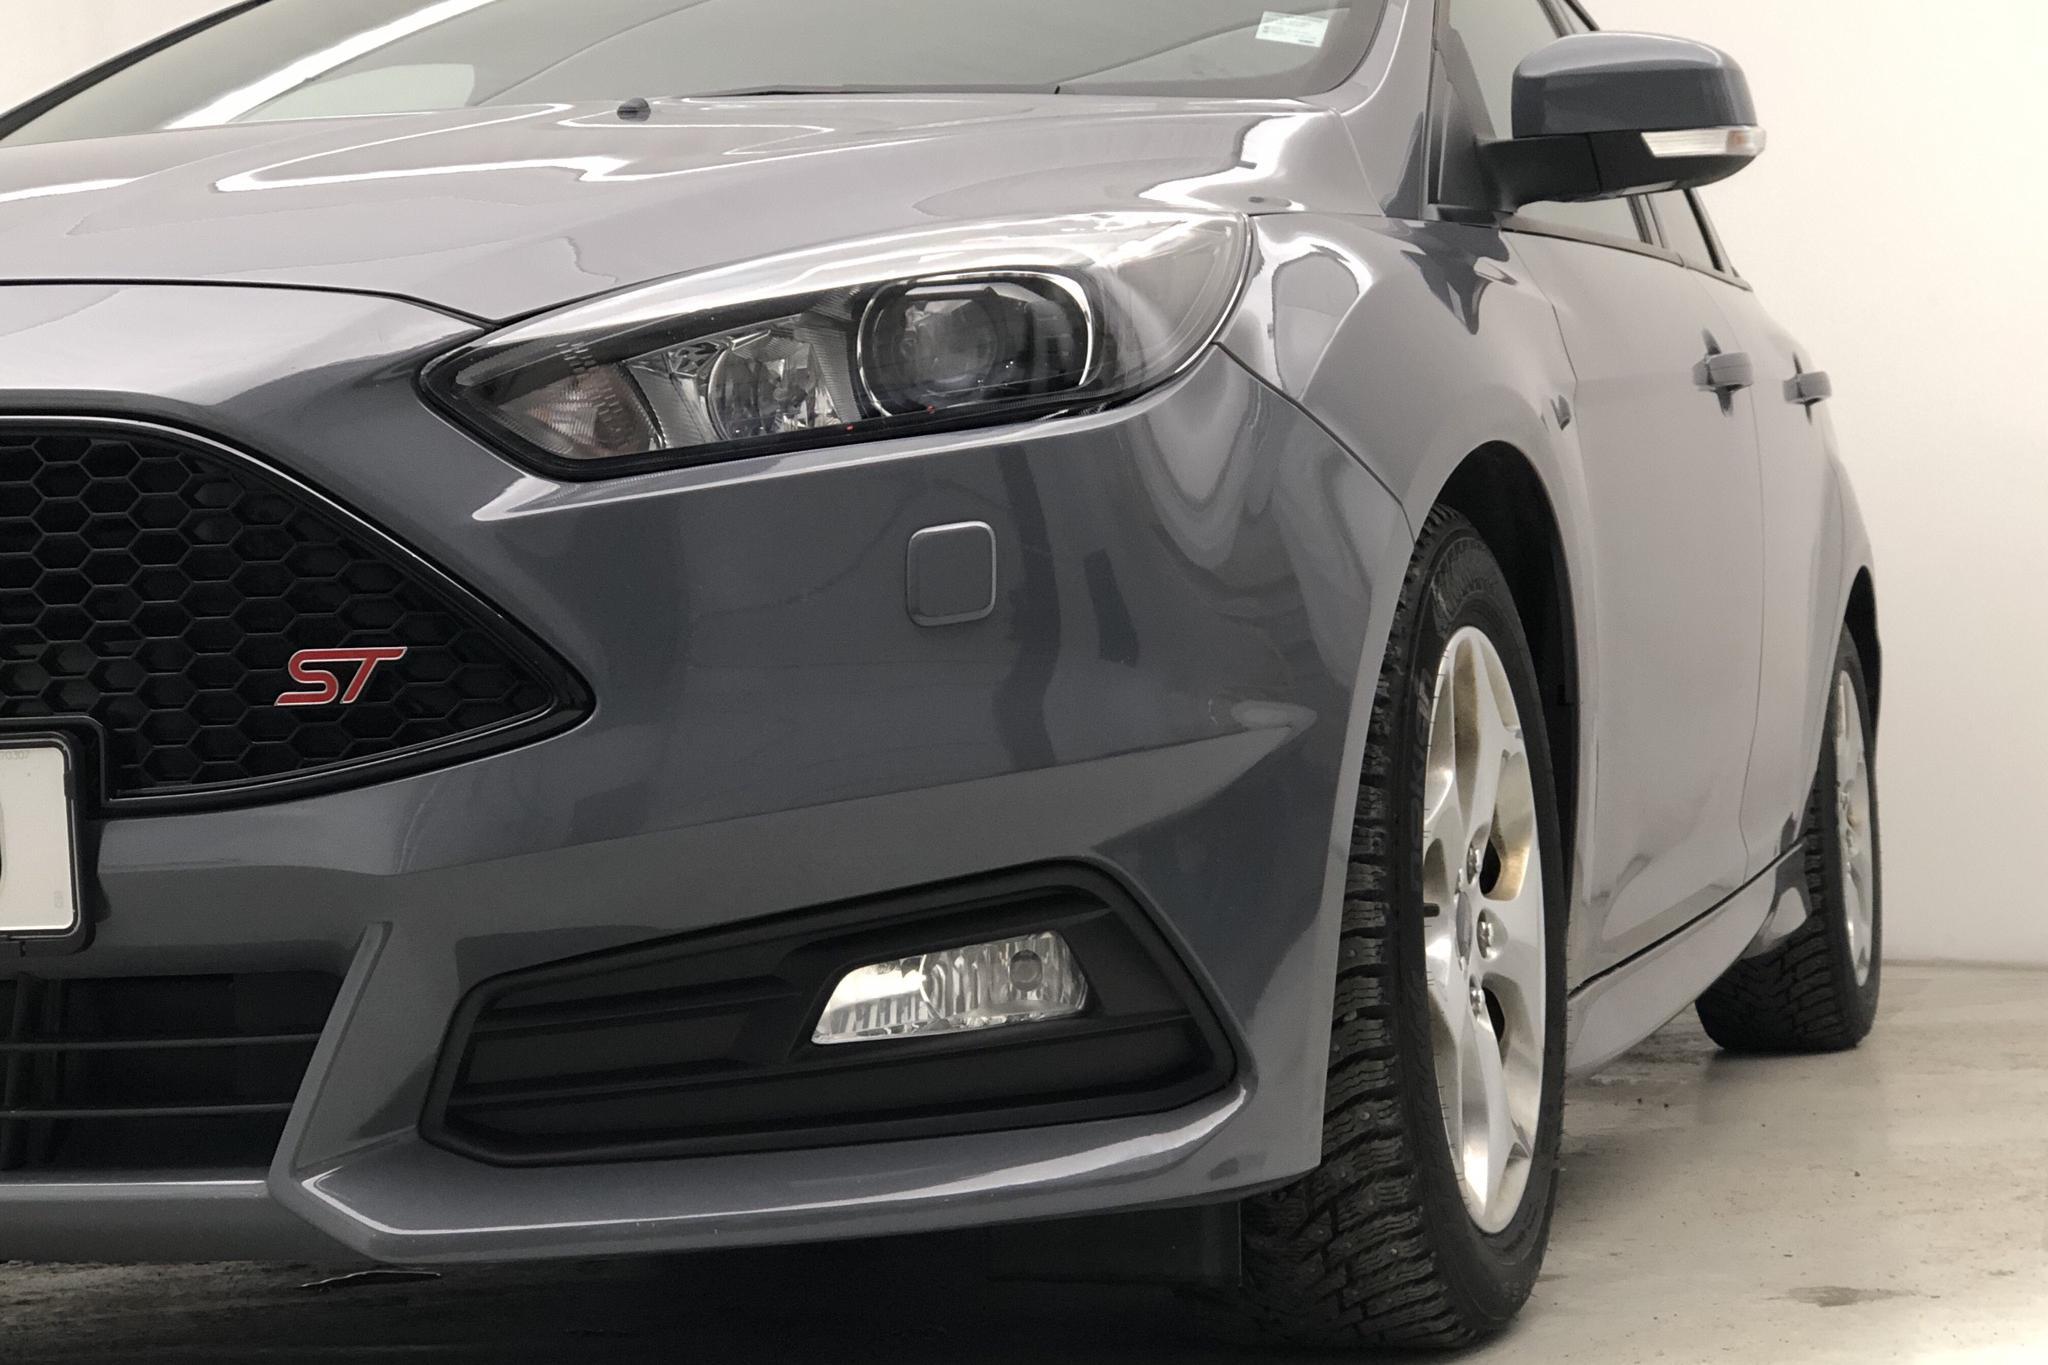 Ford Focus 2.0 TDCi Kombi (180hk) - 4 031 mil - Automat - grå - 2017